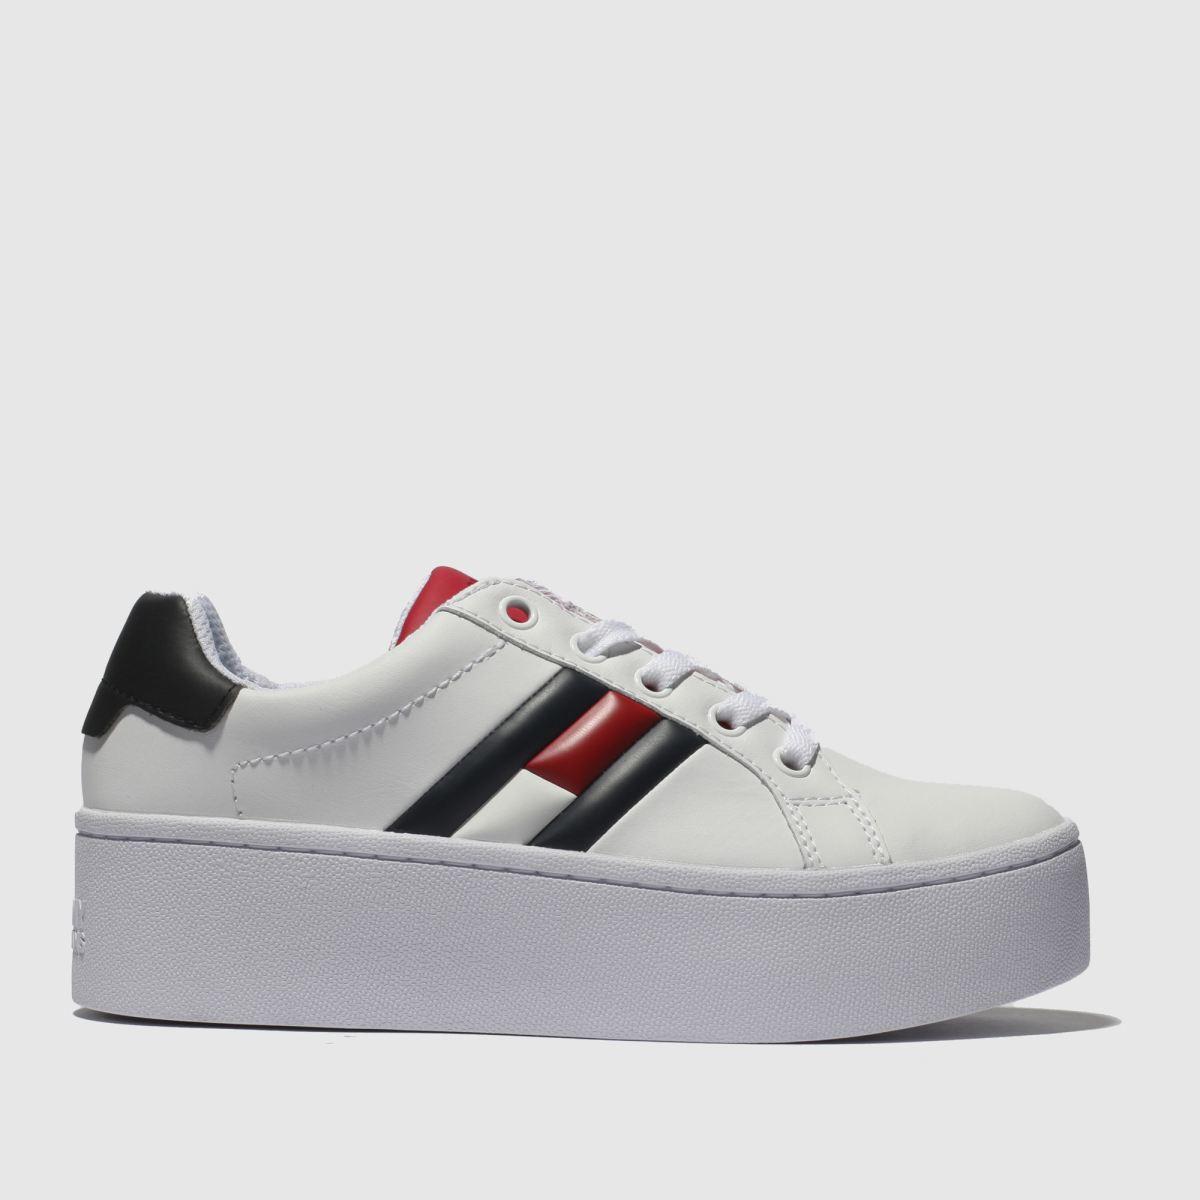 Tommy Hilfiger White & Navy Flatform Flag Sneaker Trainers